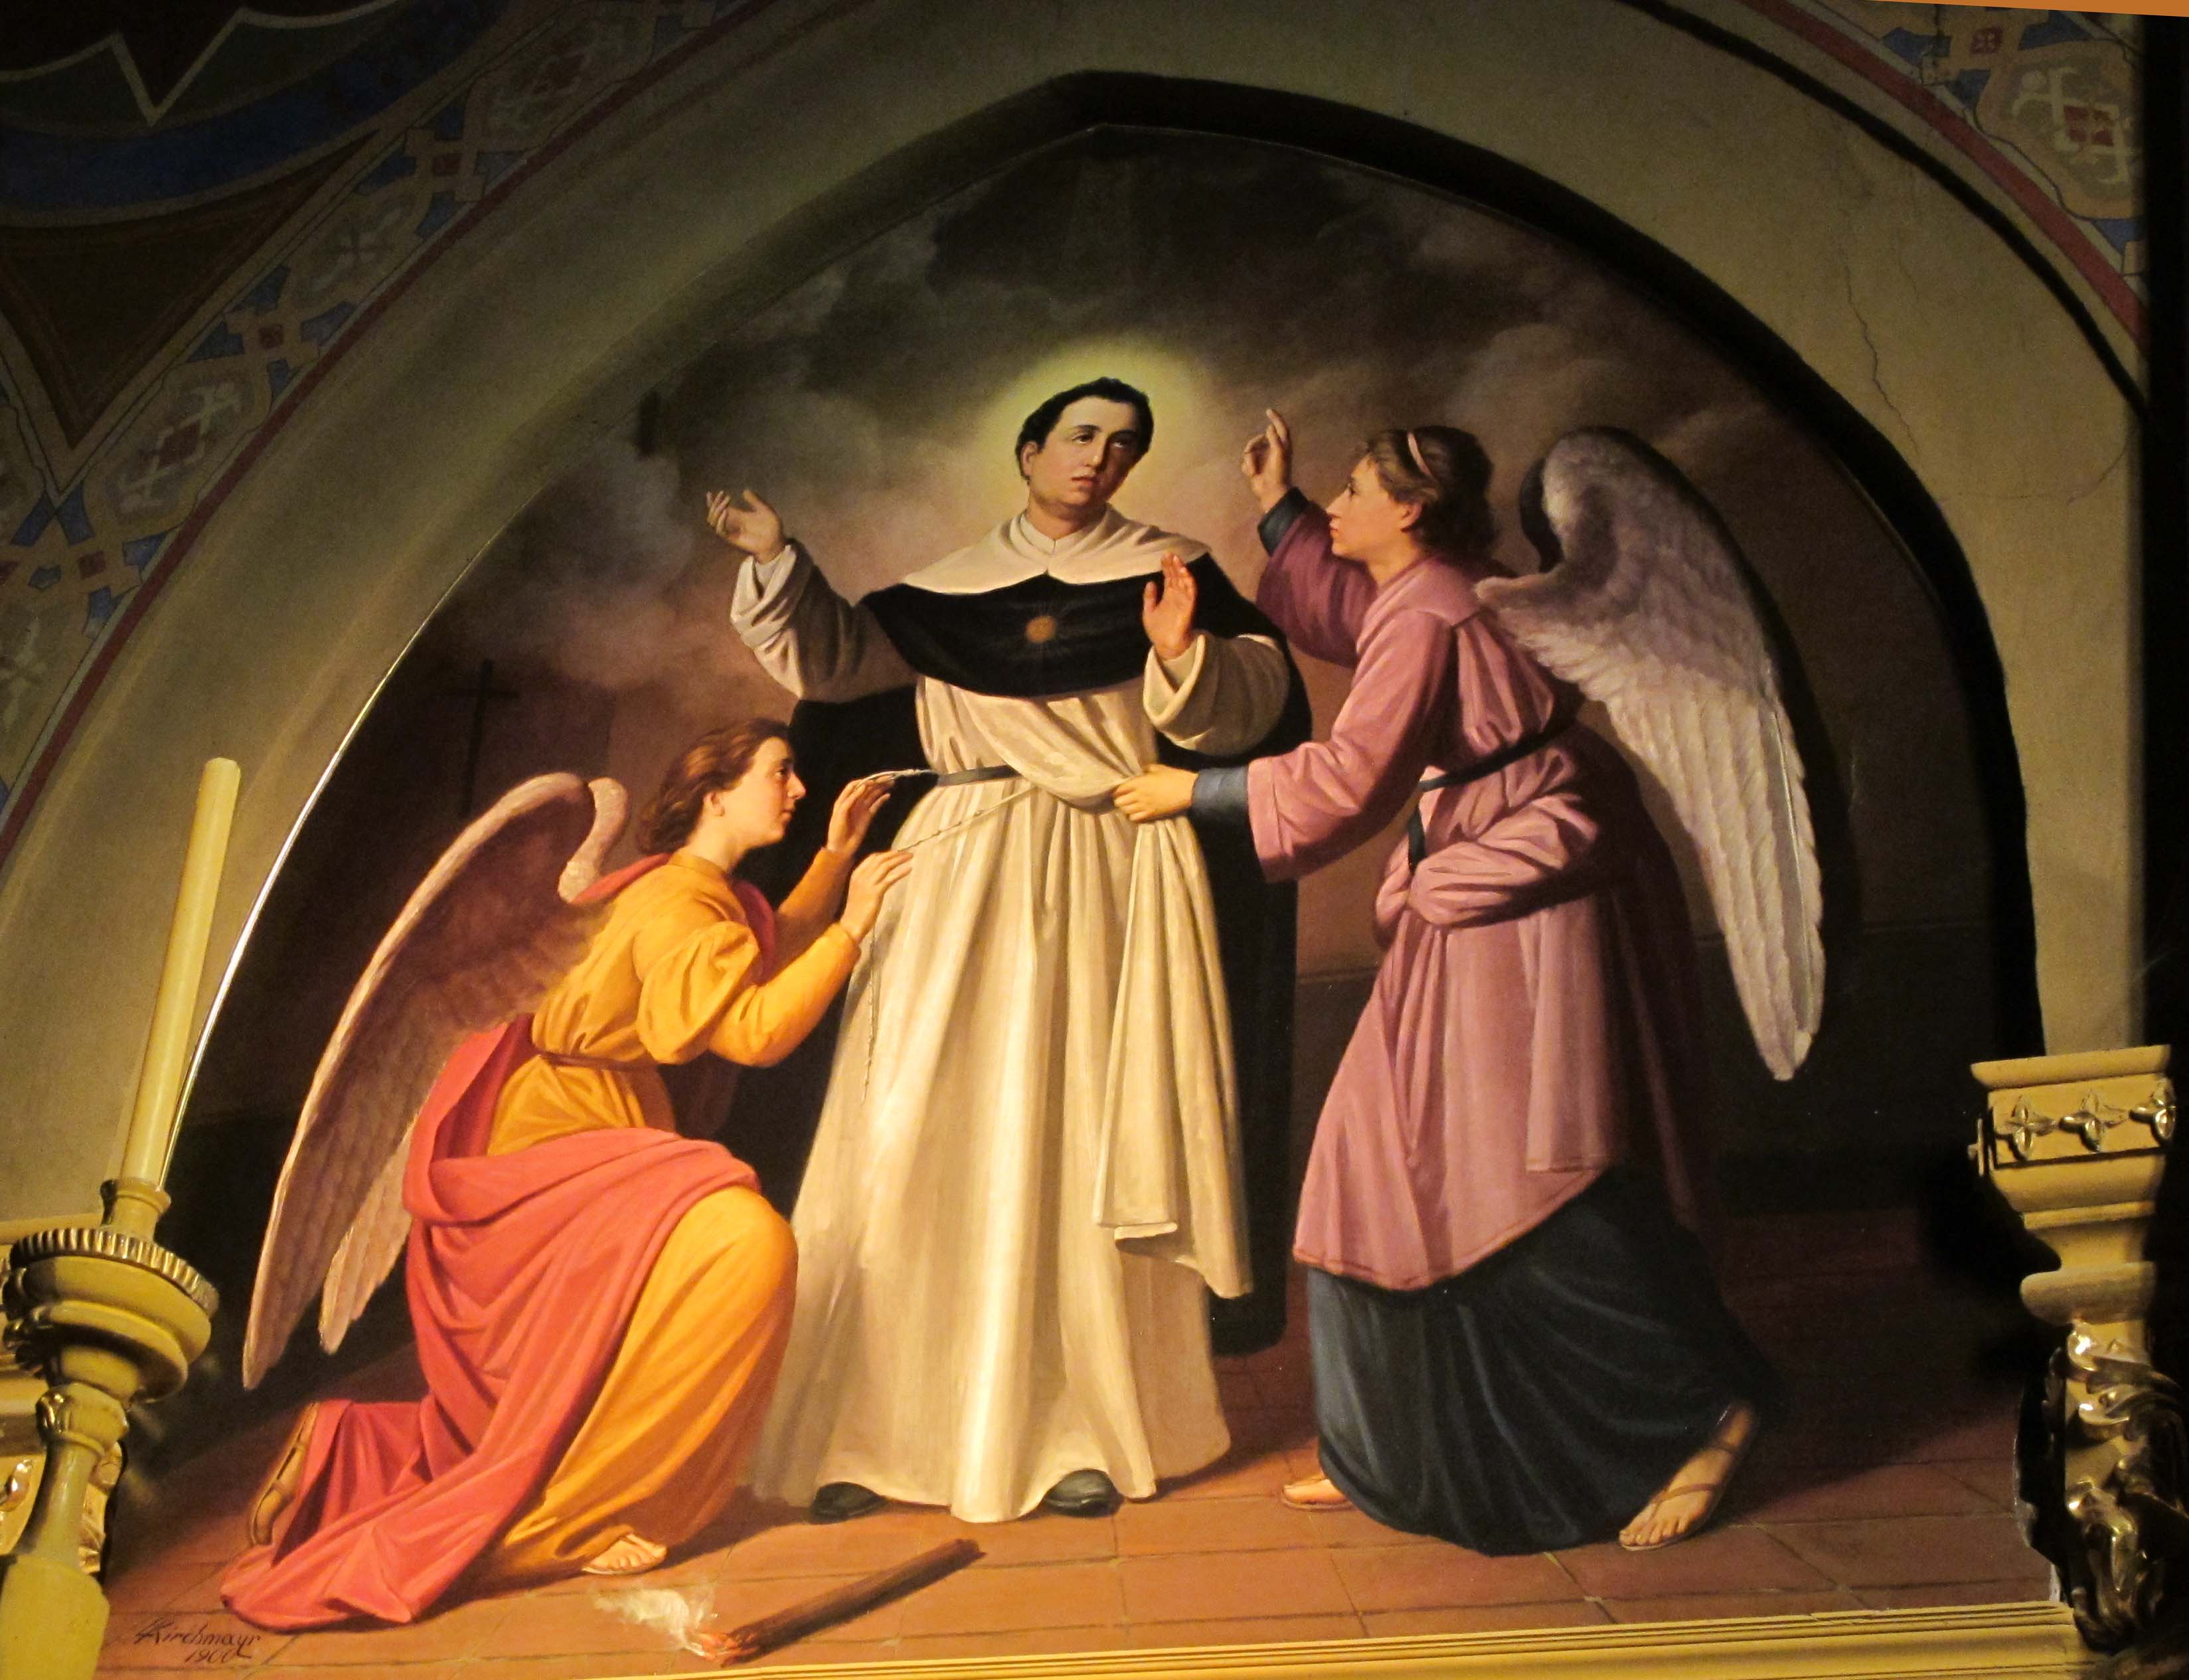 KIRCHMAYR ANGELO, San Tommaso d'Aquino (1899 ca.)